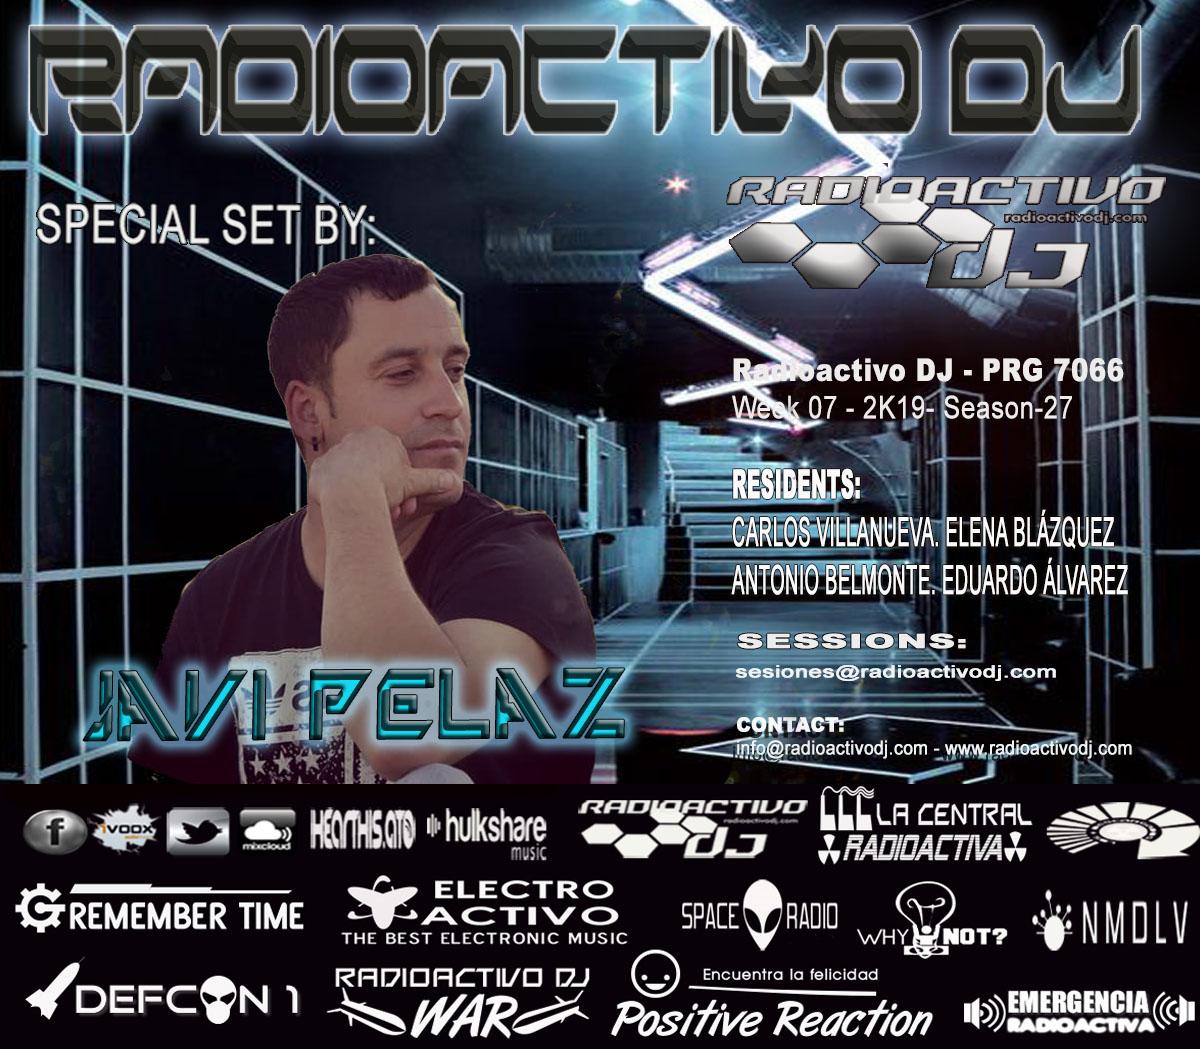 RADIOACTIVO-DJ-07-2019